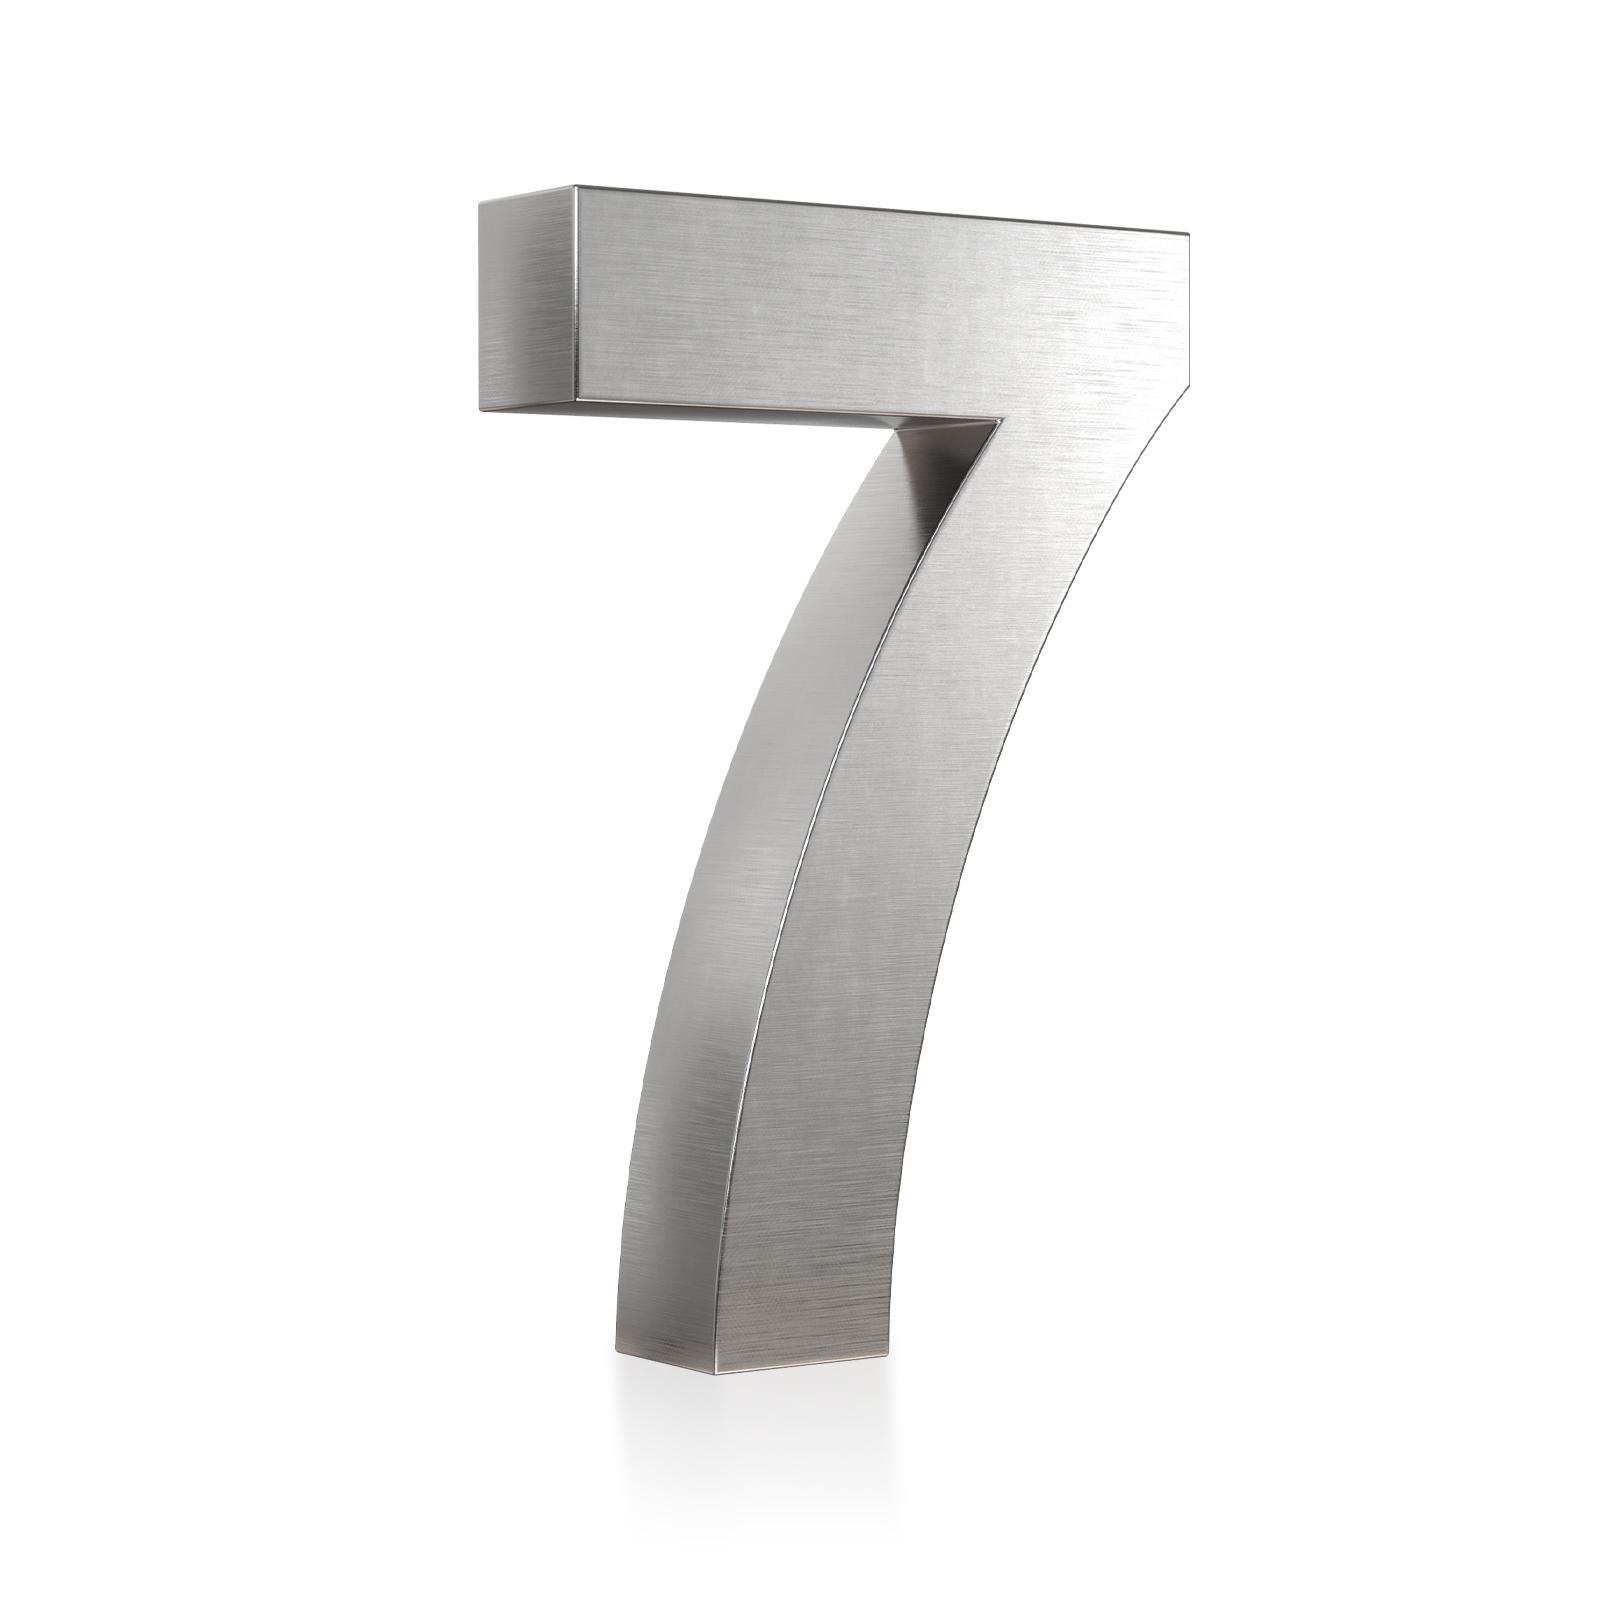 3D Hausnummer 7 Edelstahl in 3D Design Arial V2A